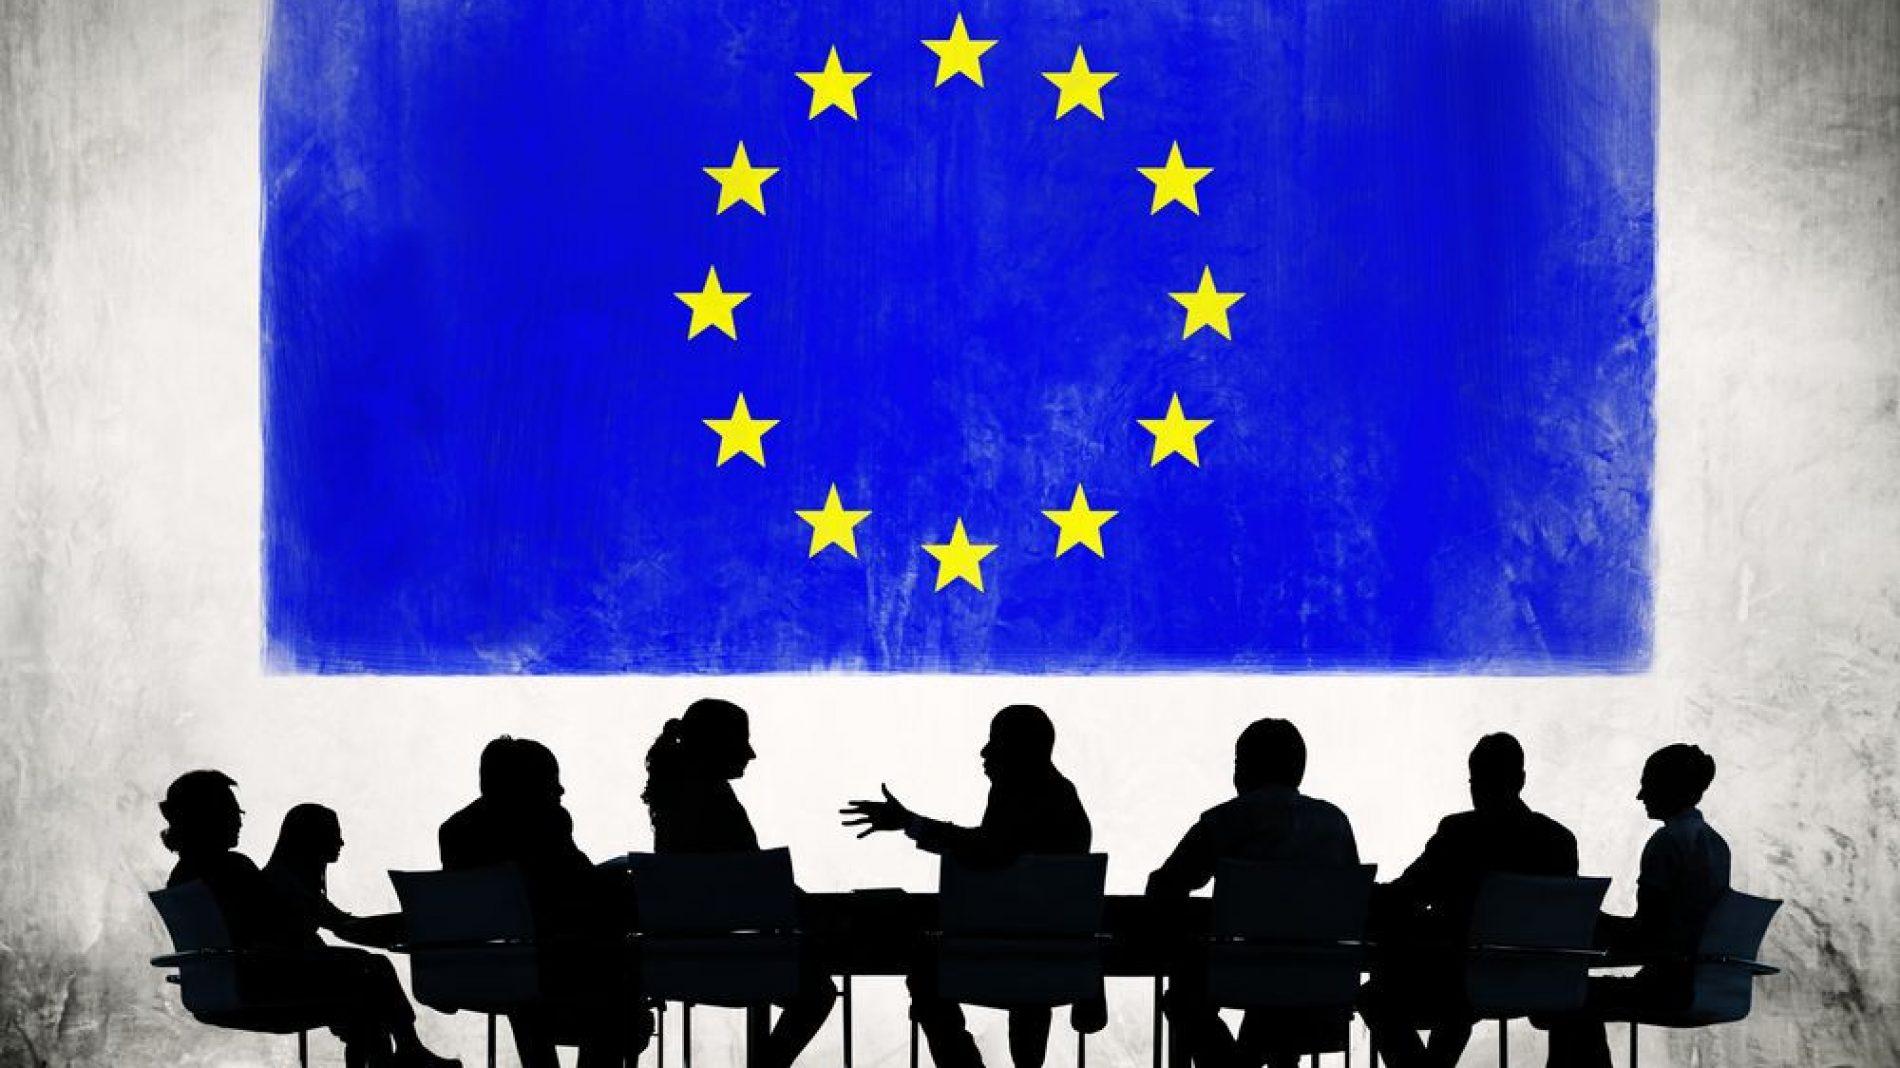 European Union flag flying